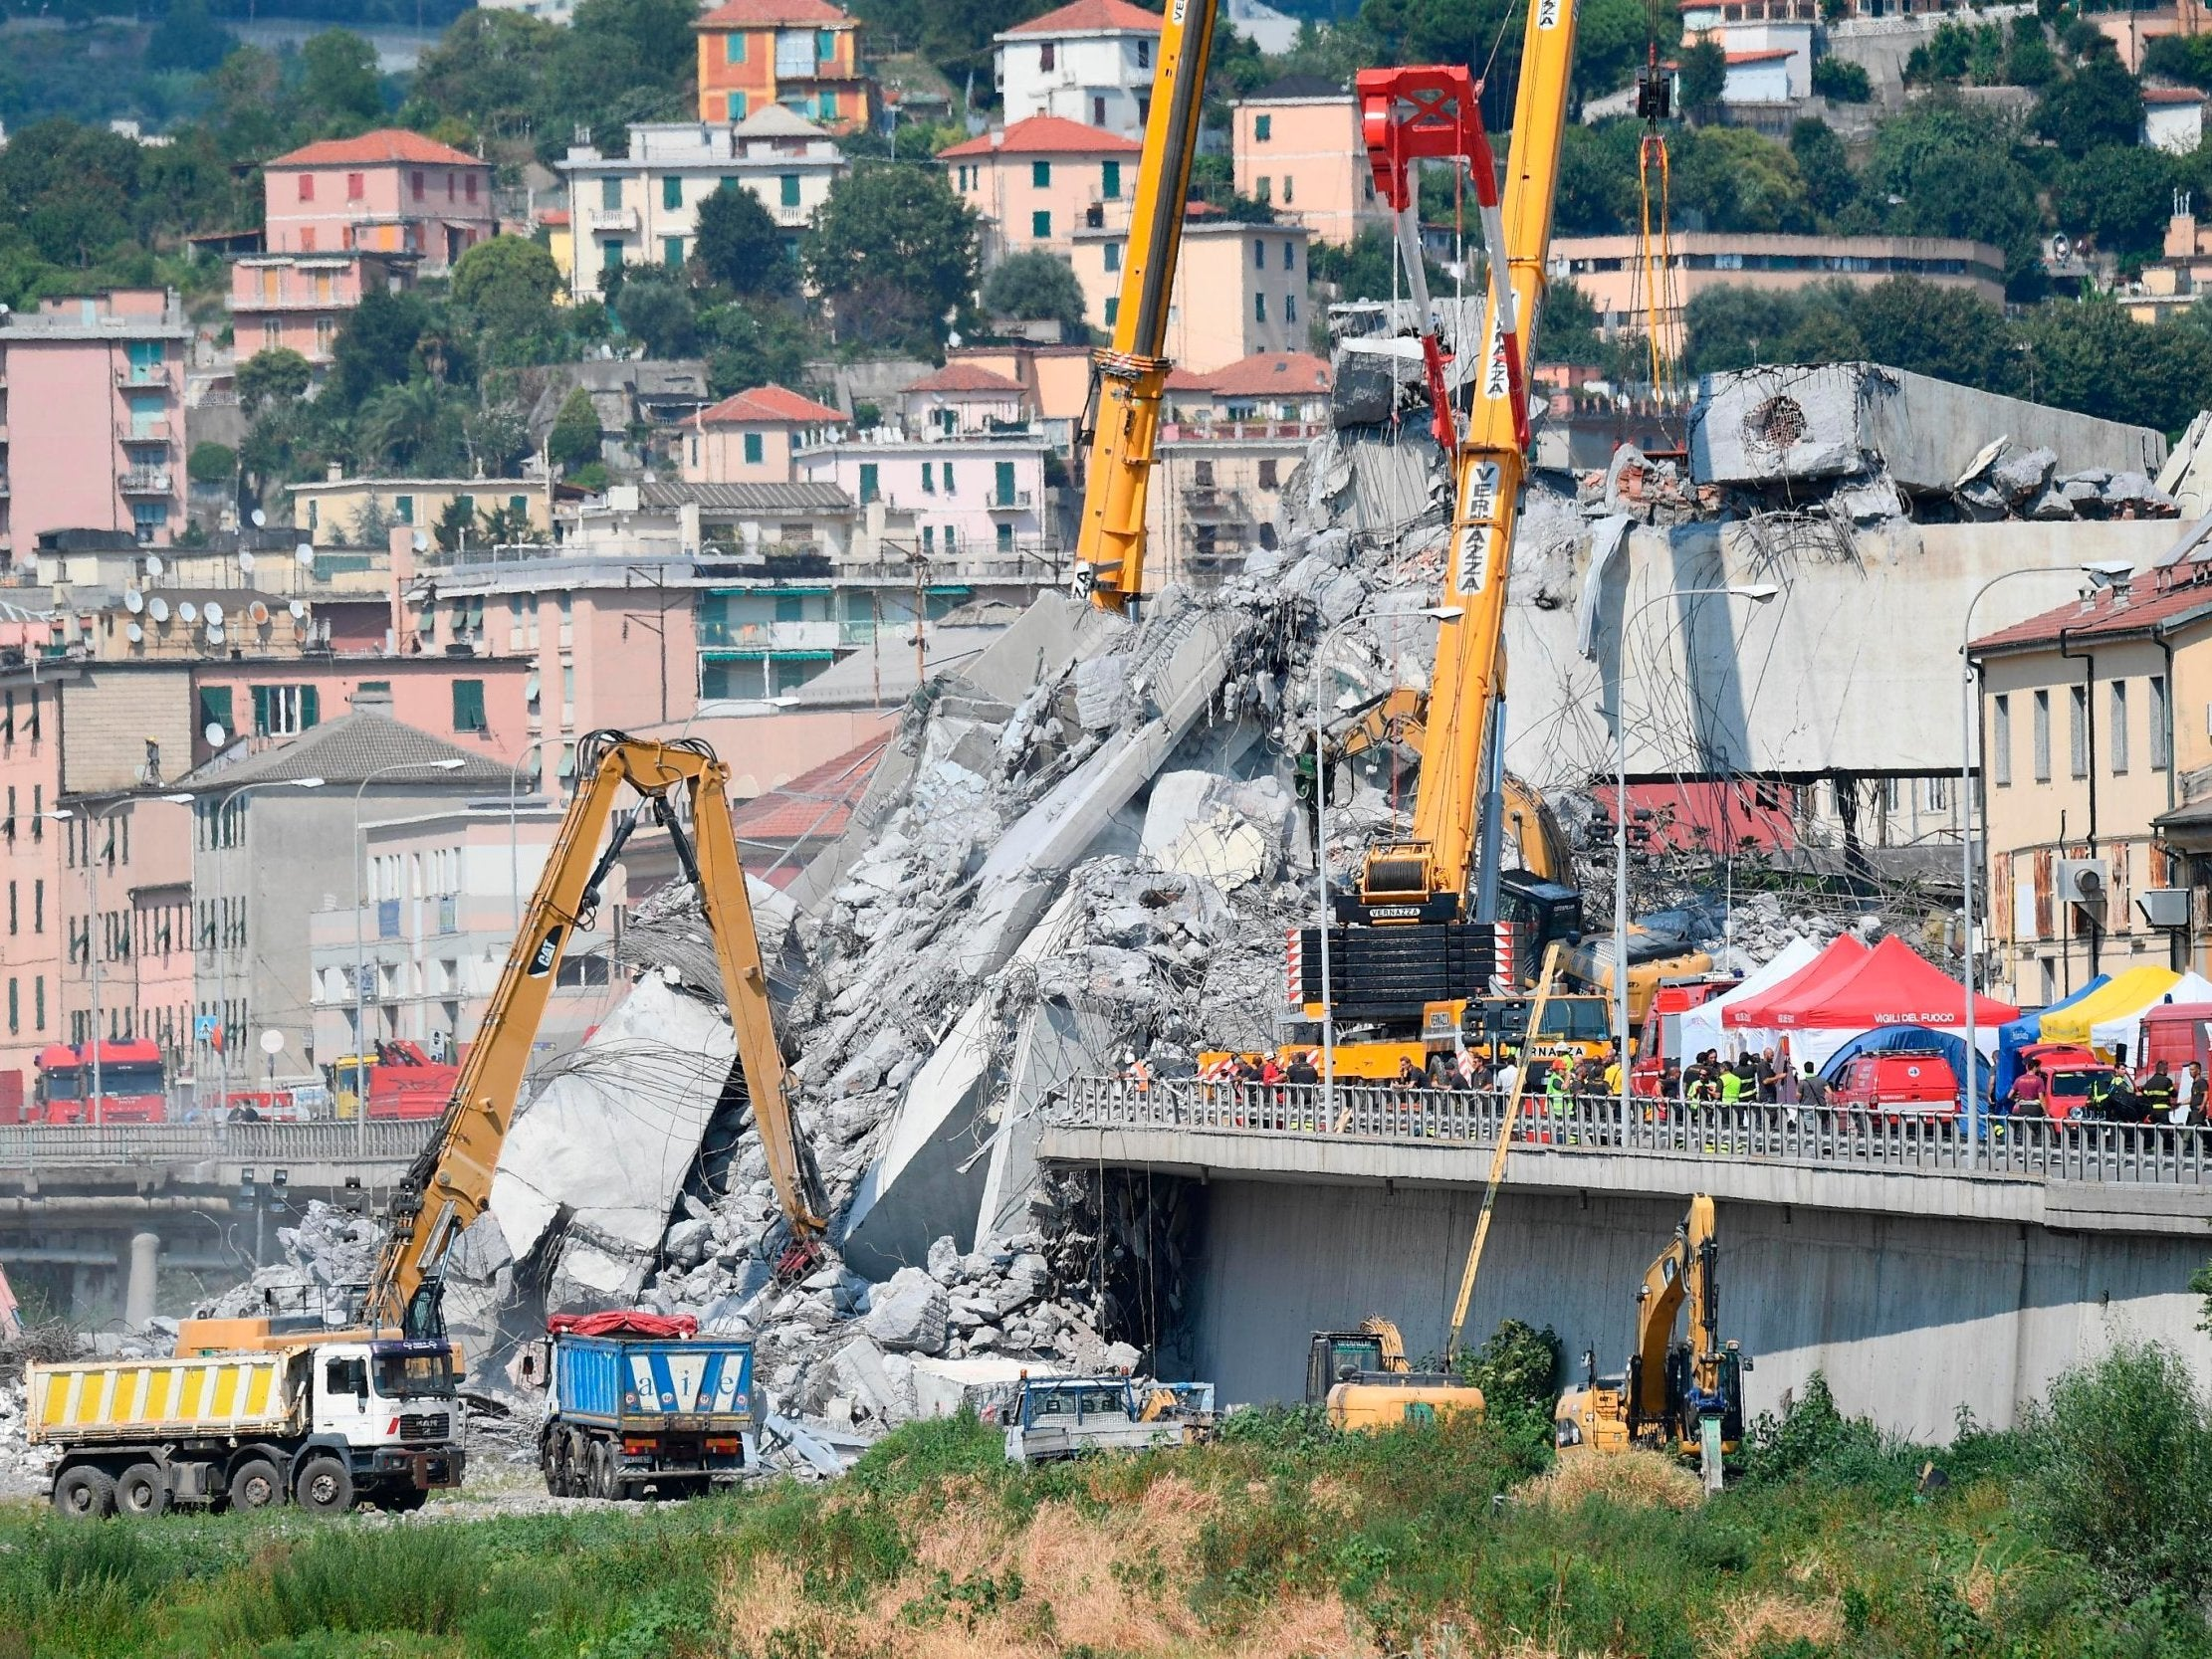 Genoa bridge collapse: Creaking noises prompt alarm among